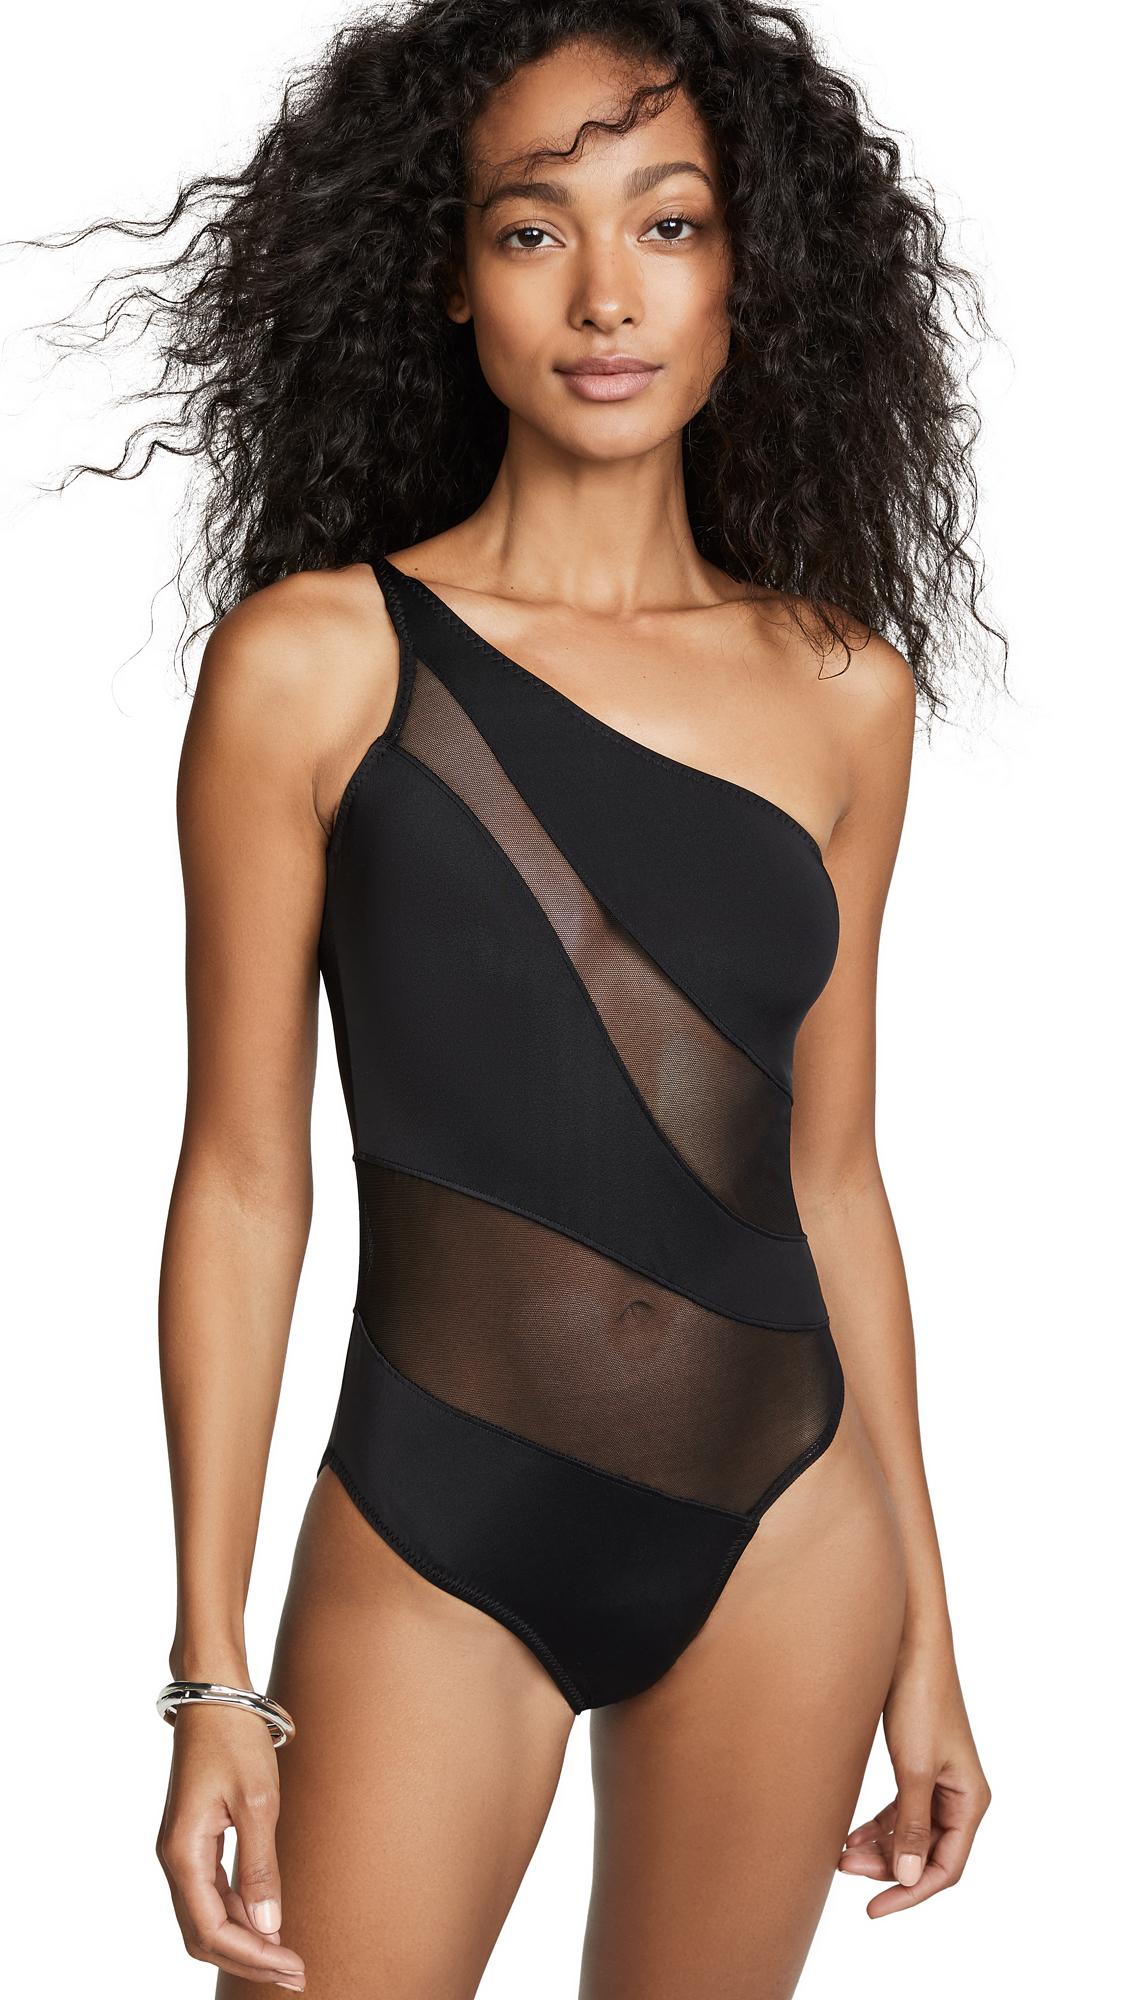 97239c639fda Norma Kamali Swimsuits and Bikinis | Norma Kamali Women's Swimwear ...